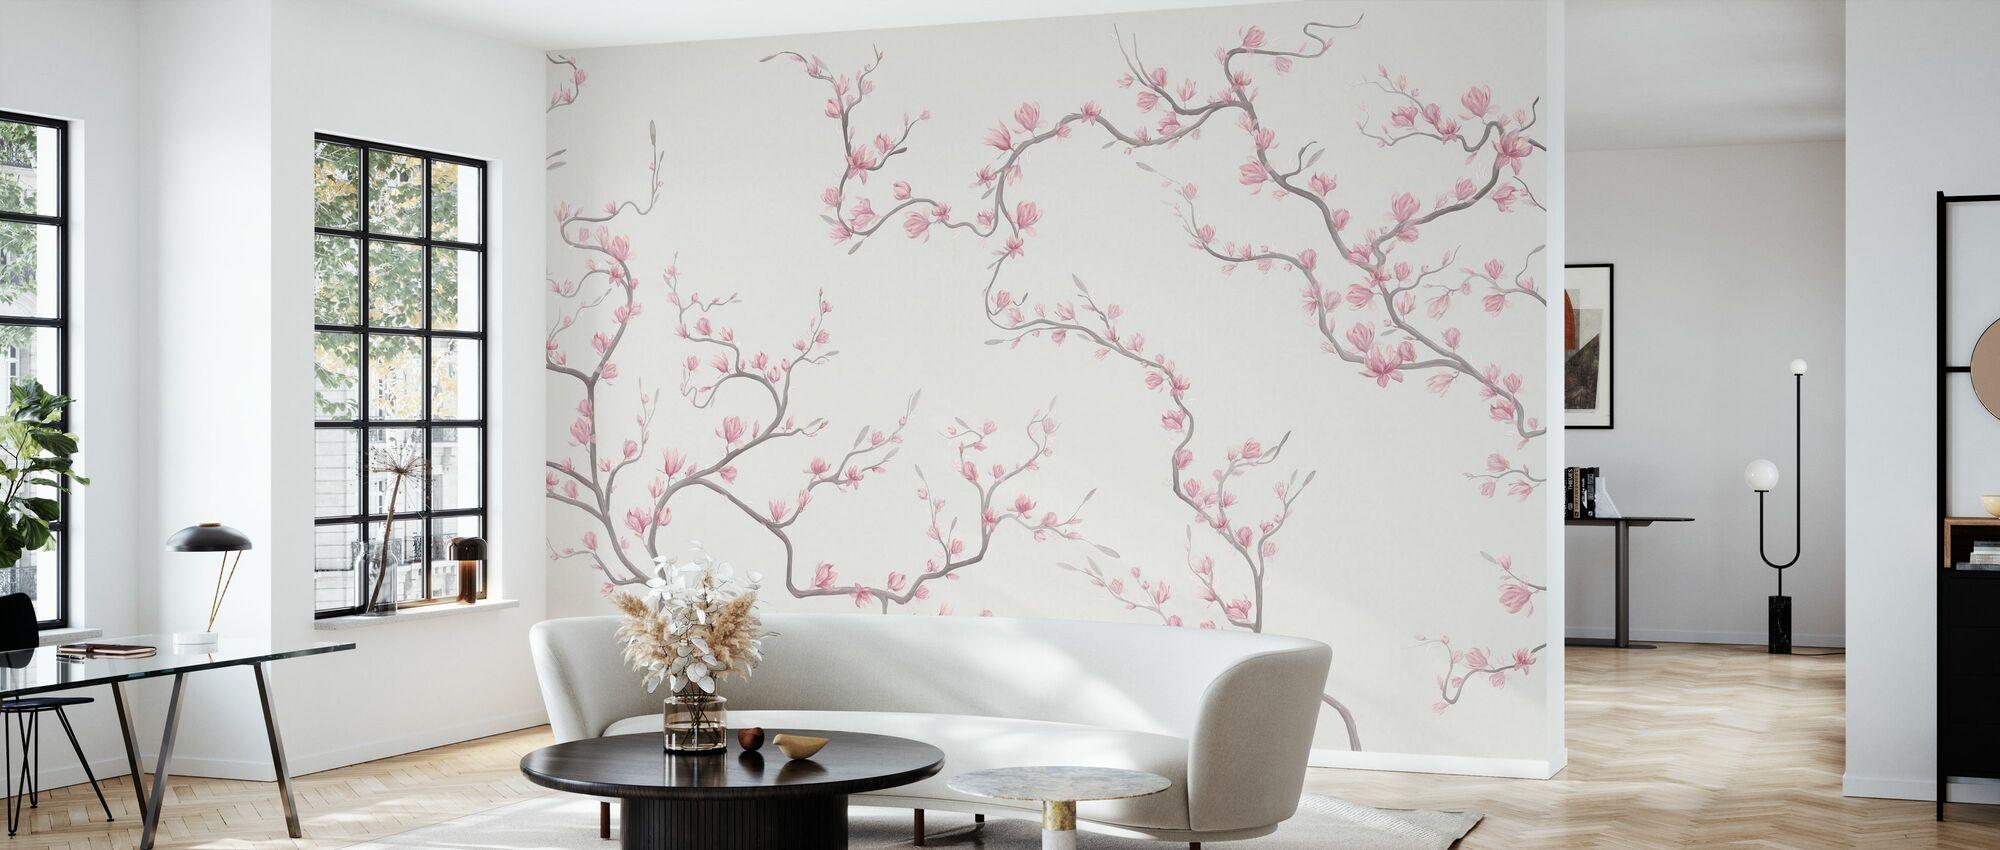 Flourishing Magnolia - Natur - Tapet - Stue